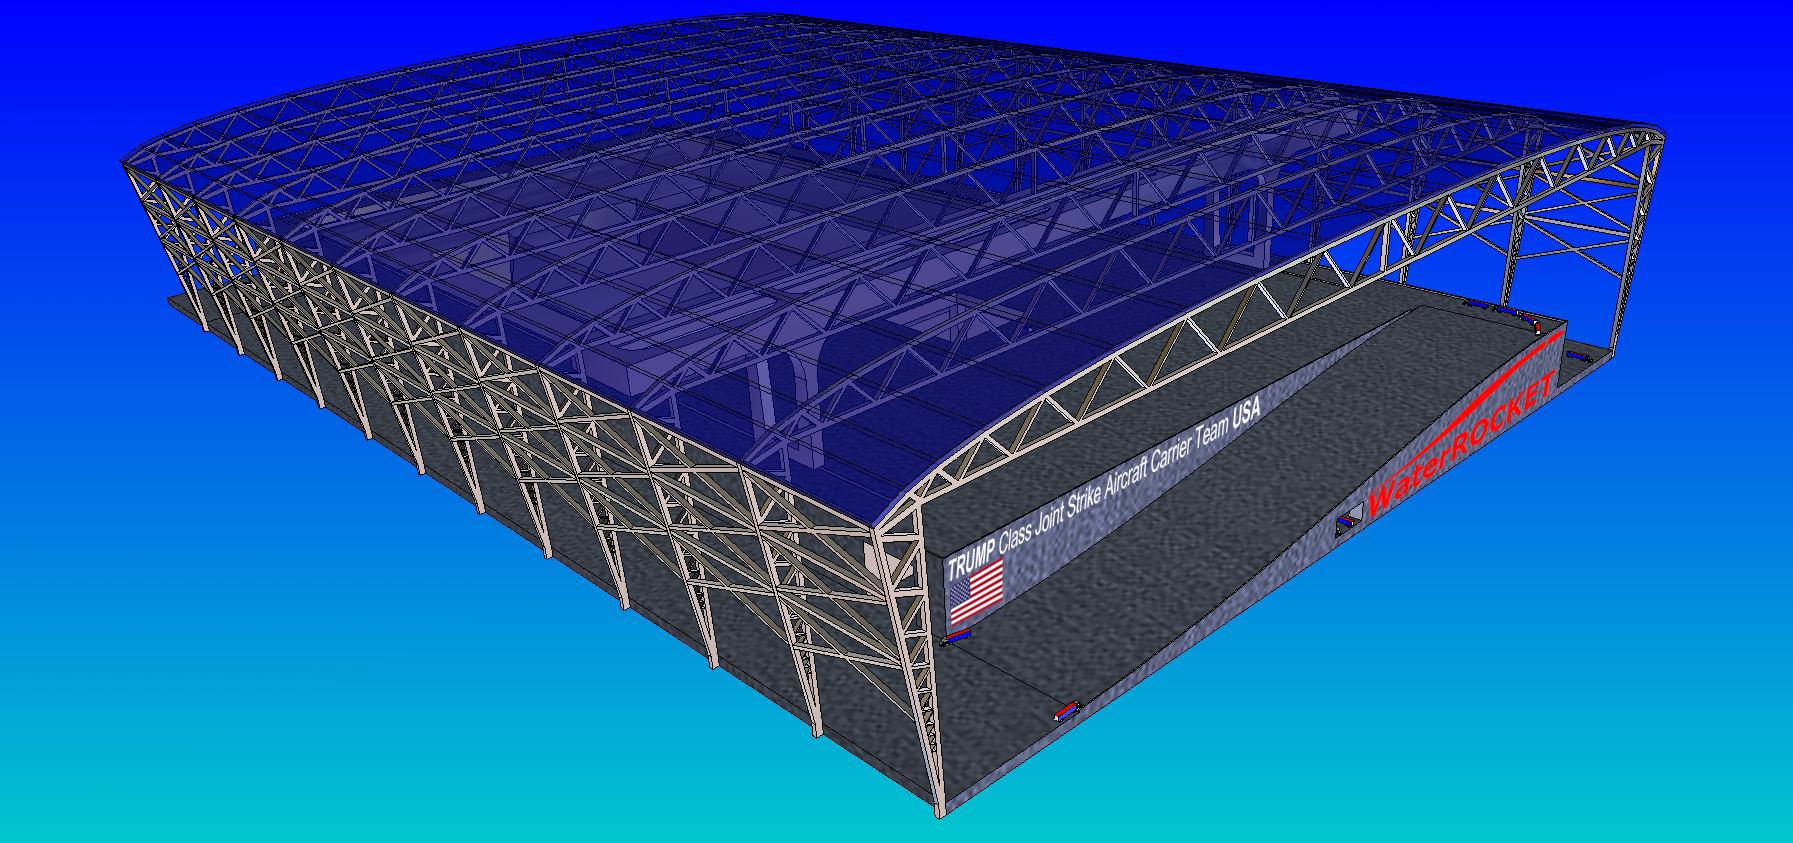 trump concrete mold assem1f2